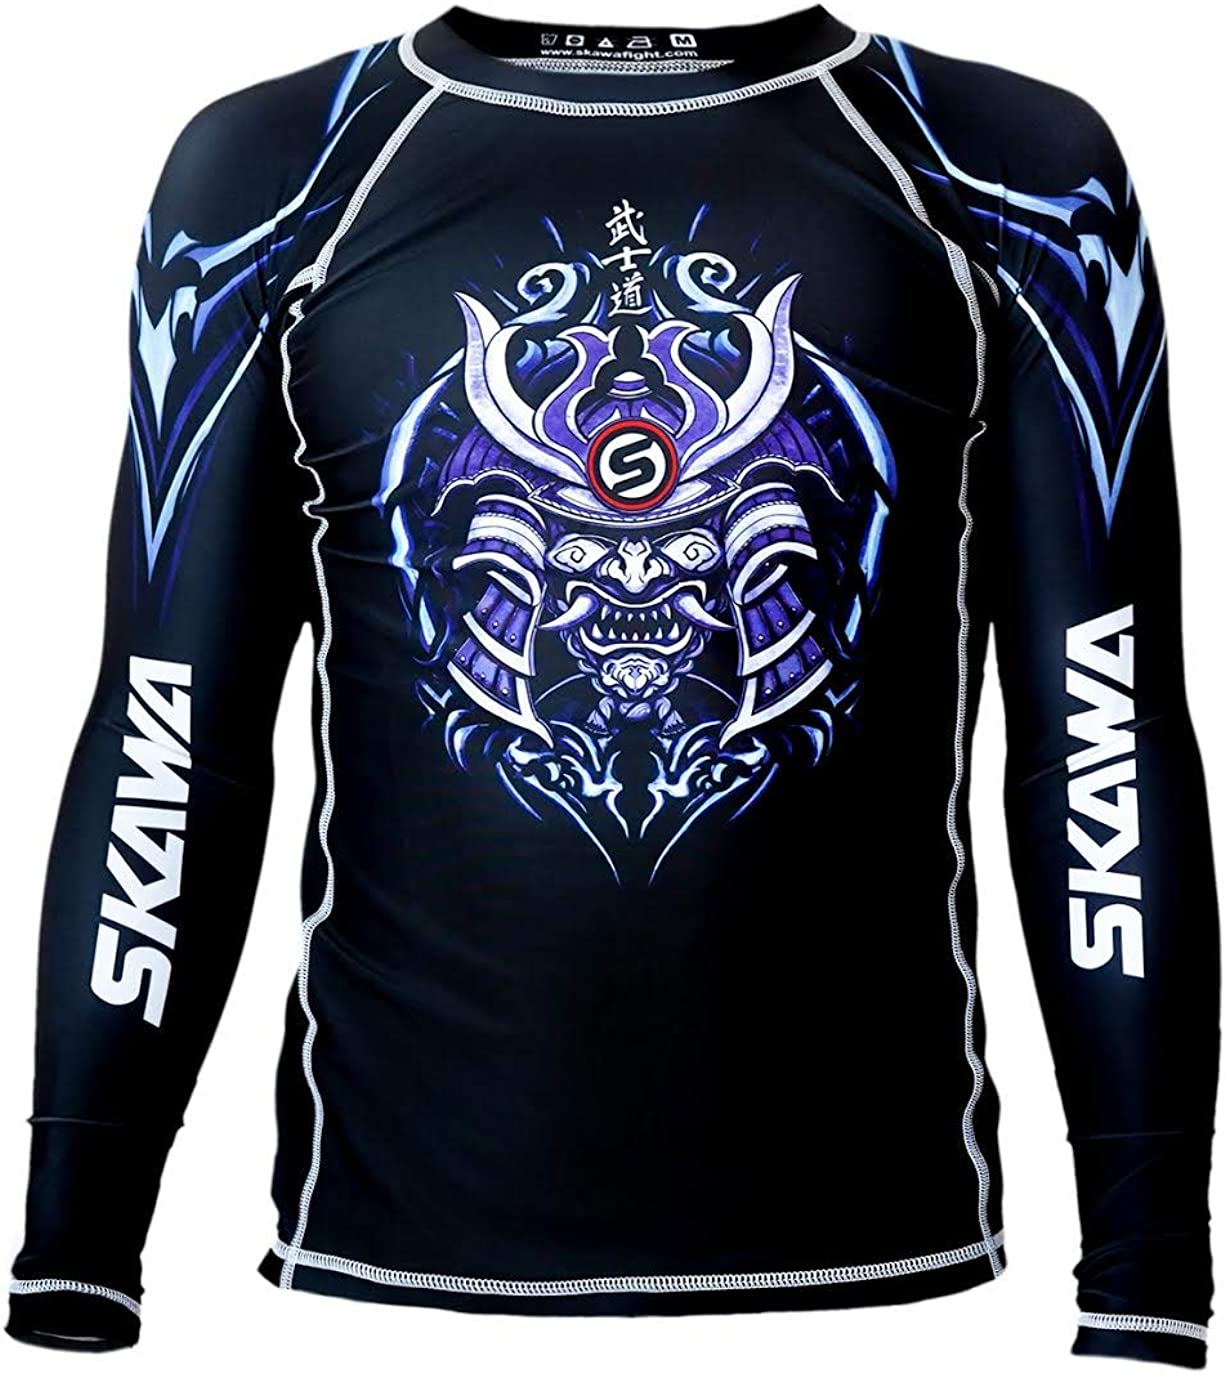 SKAWA Mens Samurai No Gi Long Rashguard MMA Super popular specialty store Sleeve BJJ Under blast sales Shirt Ras